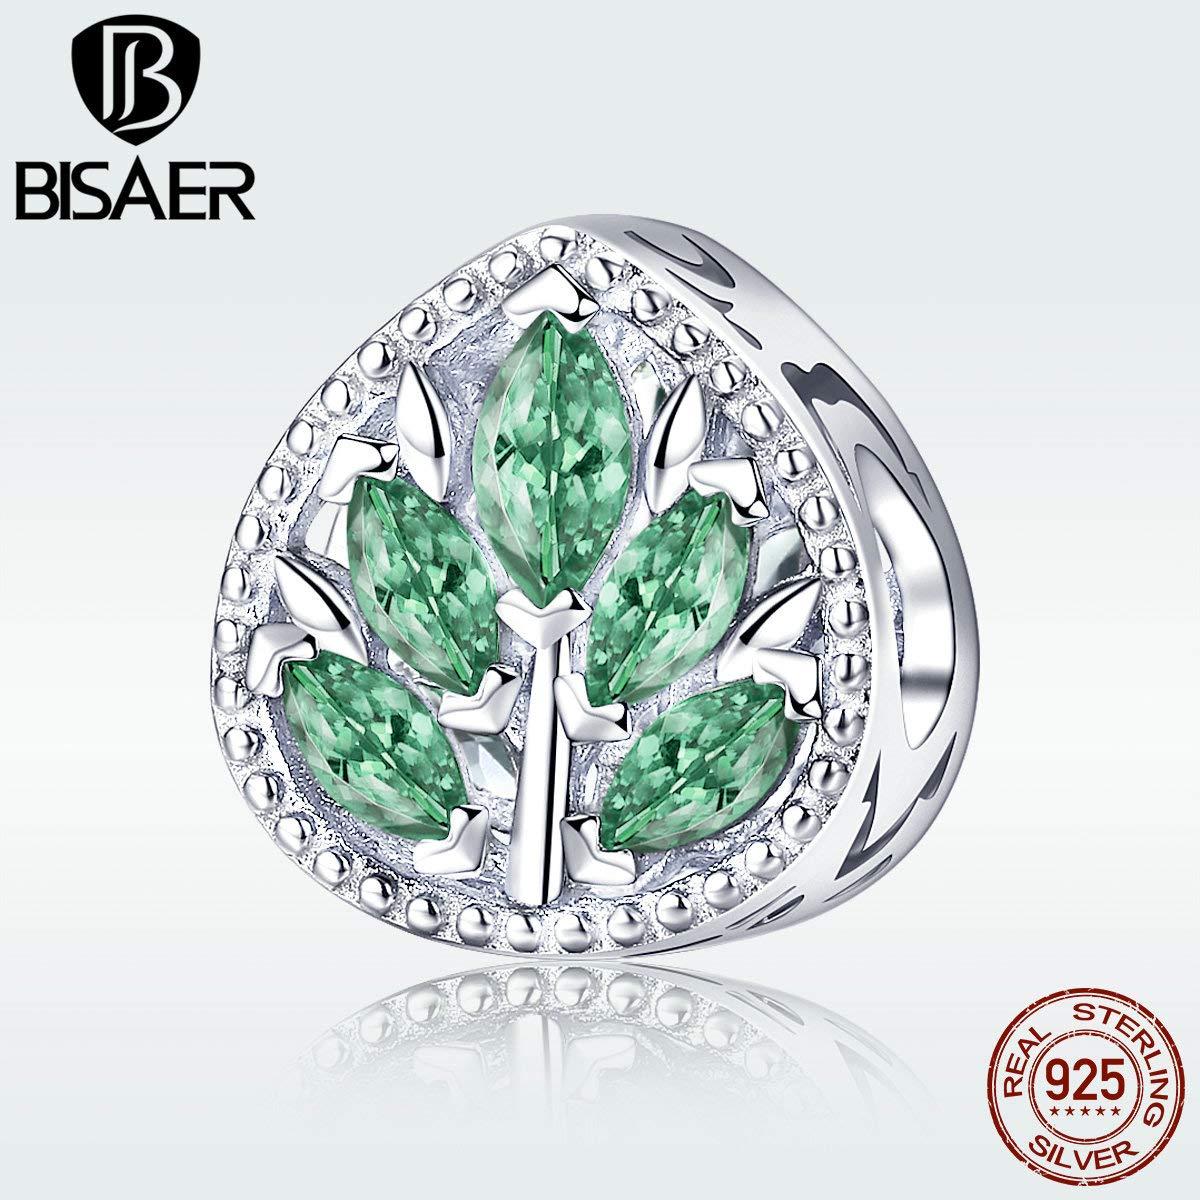 Calvas Beads Genuine 925 Sterling Silver Green Cubic Zircon Leaves Charm Fit for Female Silver Original Brand Bracelet Necklace GAC005